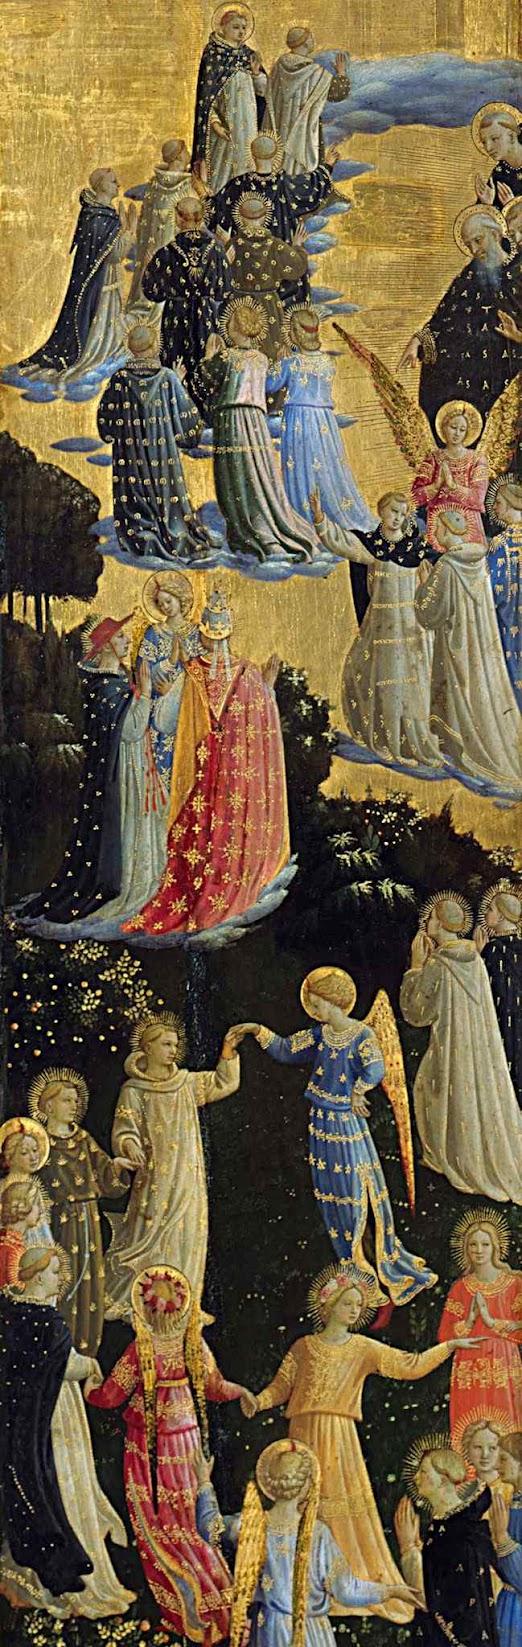 Bem-aventurados, Fra Angelico, Berlin (1395 – 1455)